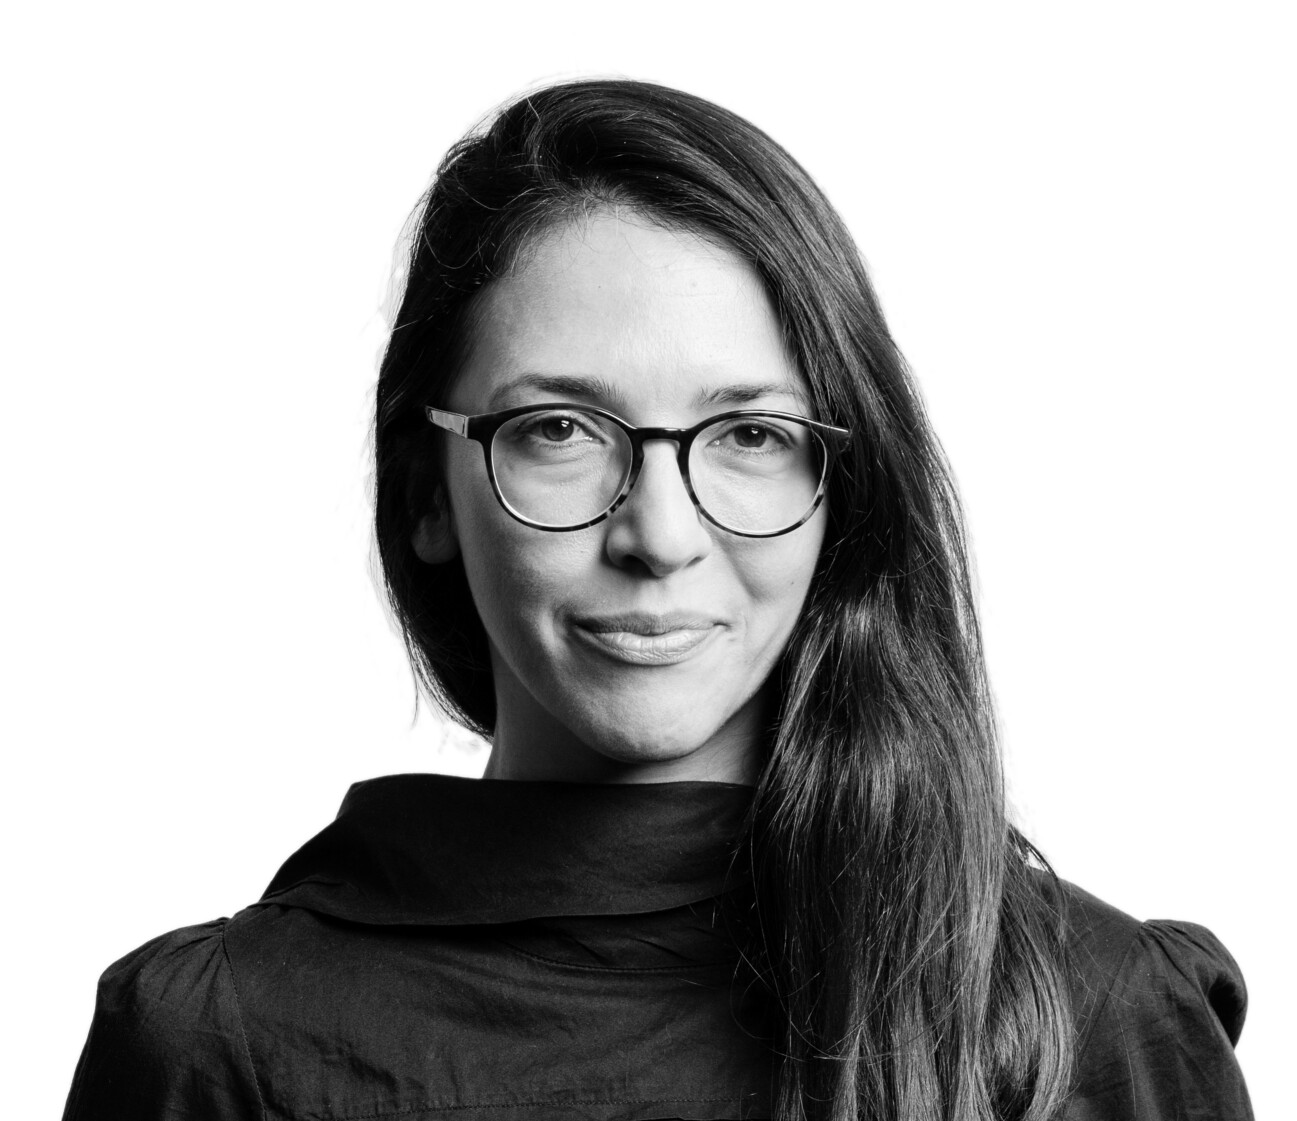 Marie-Louise Schembri